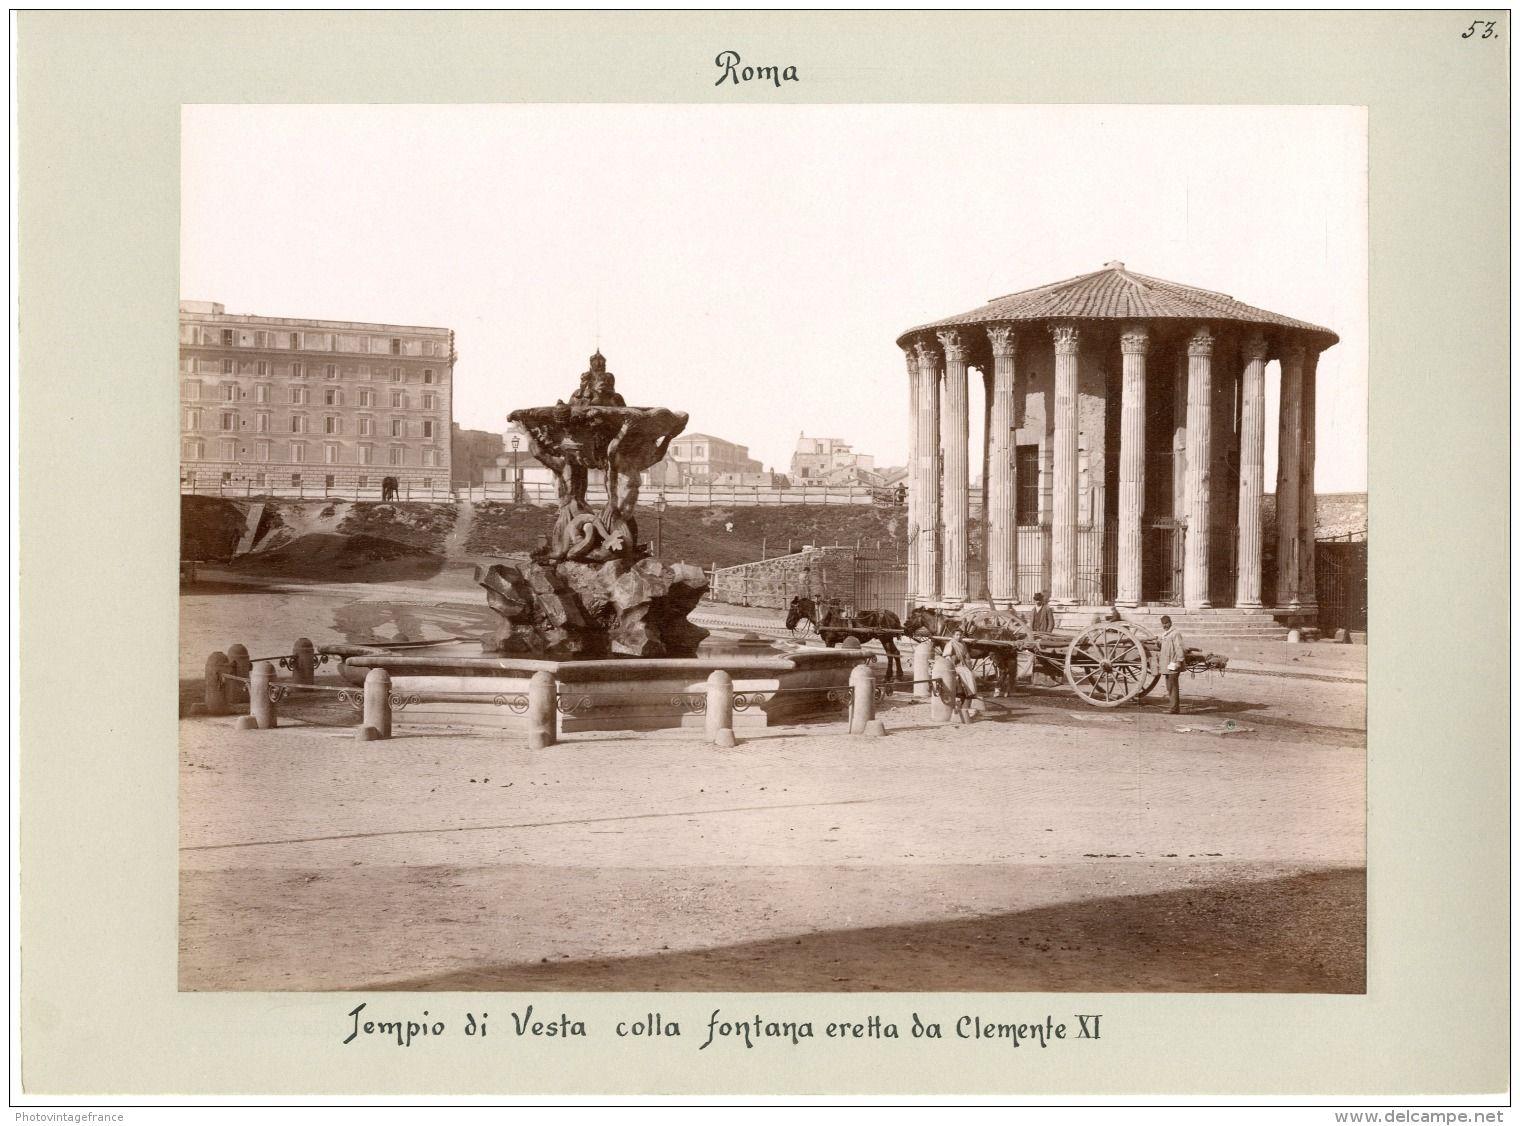 Tempio di Vesta colla fontana eretta da Clemente XI  Année : 1880